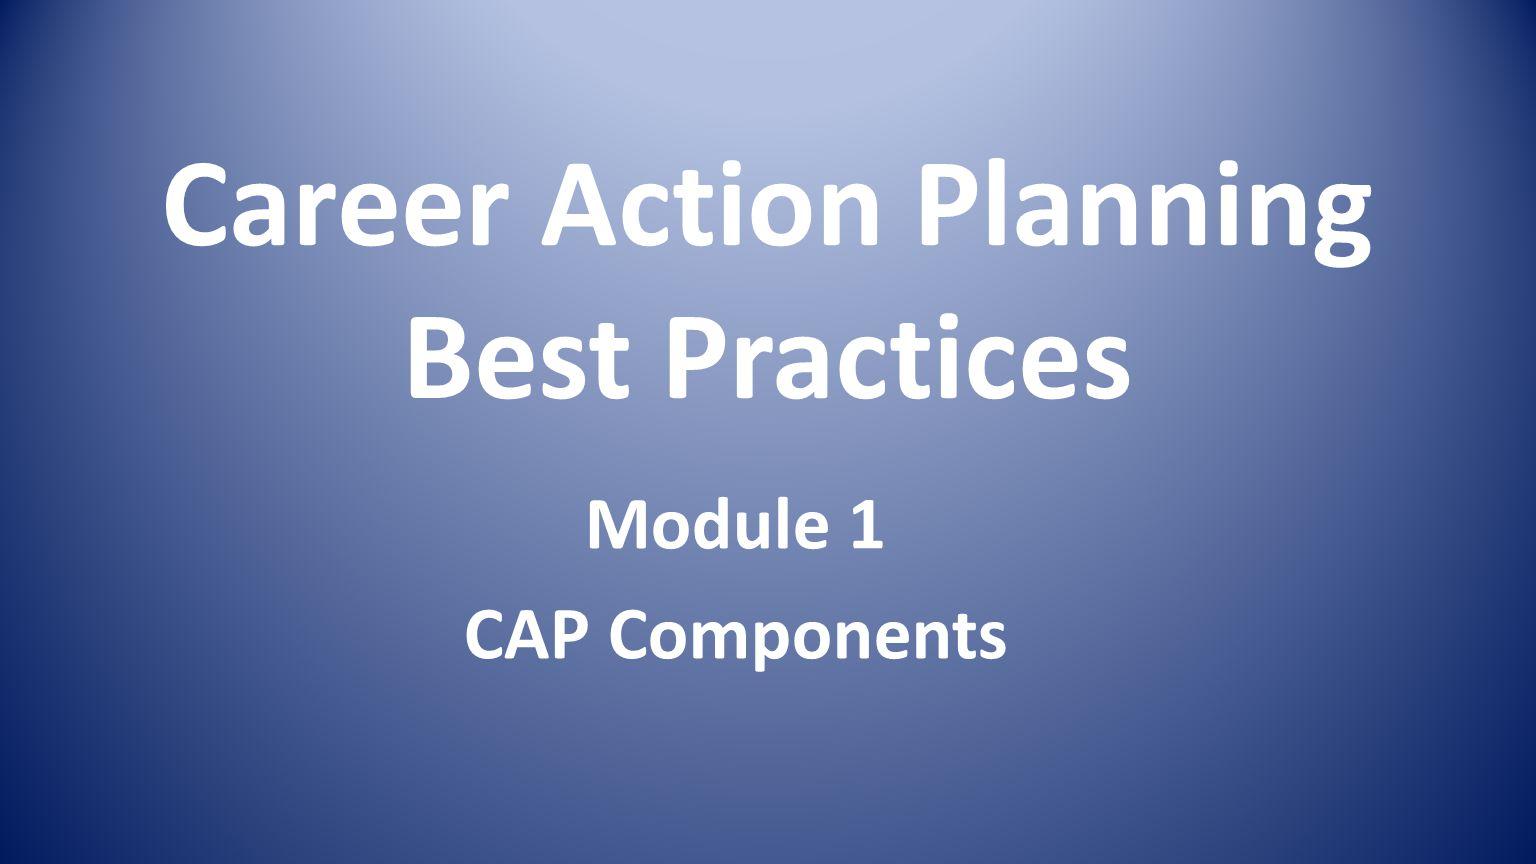 Career Action Planning Best Practices Module 1 CAP Components